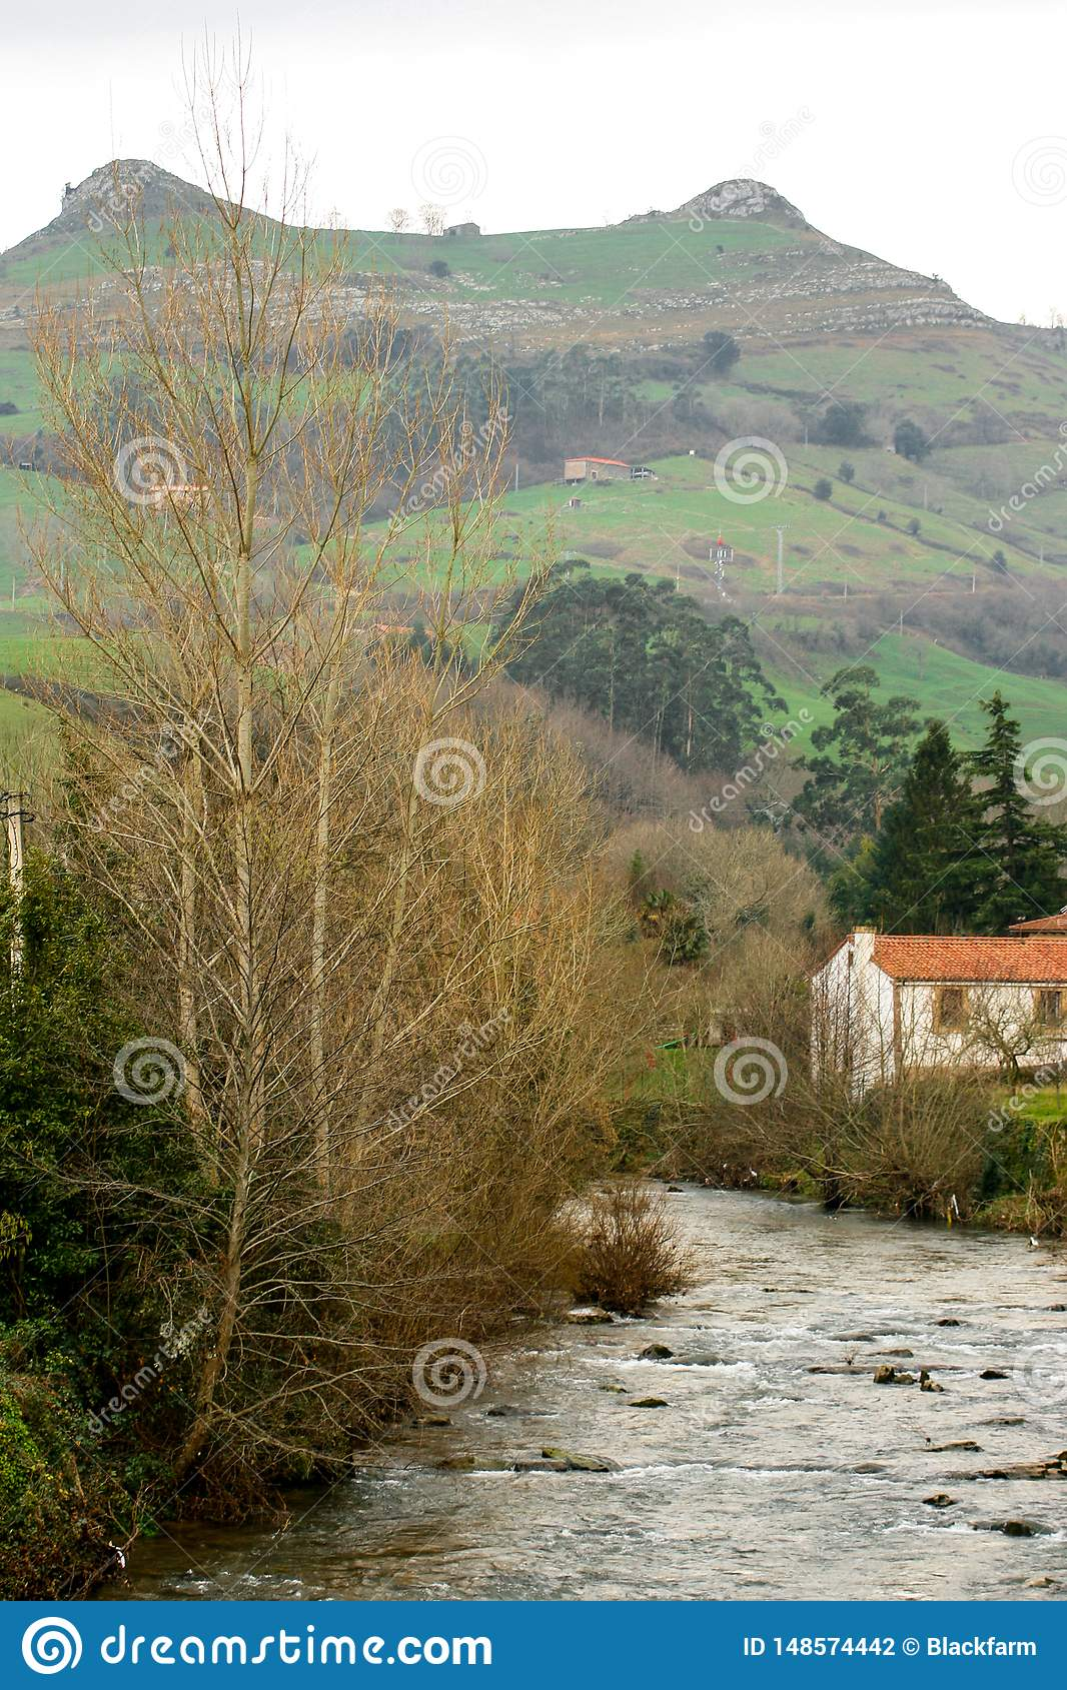 Pi?kny krajobraz Busampiro szczyty i Miera rzeka od pi?knego miasteczka Lierganes, Cantabria Lasu dos tetas